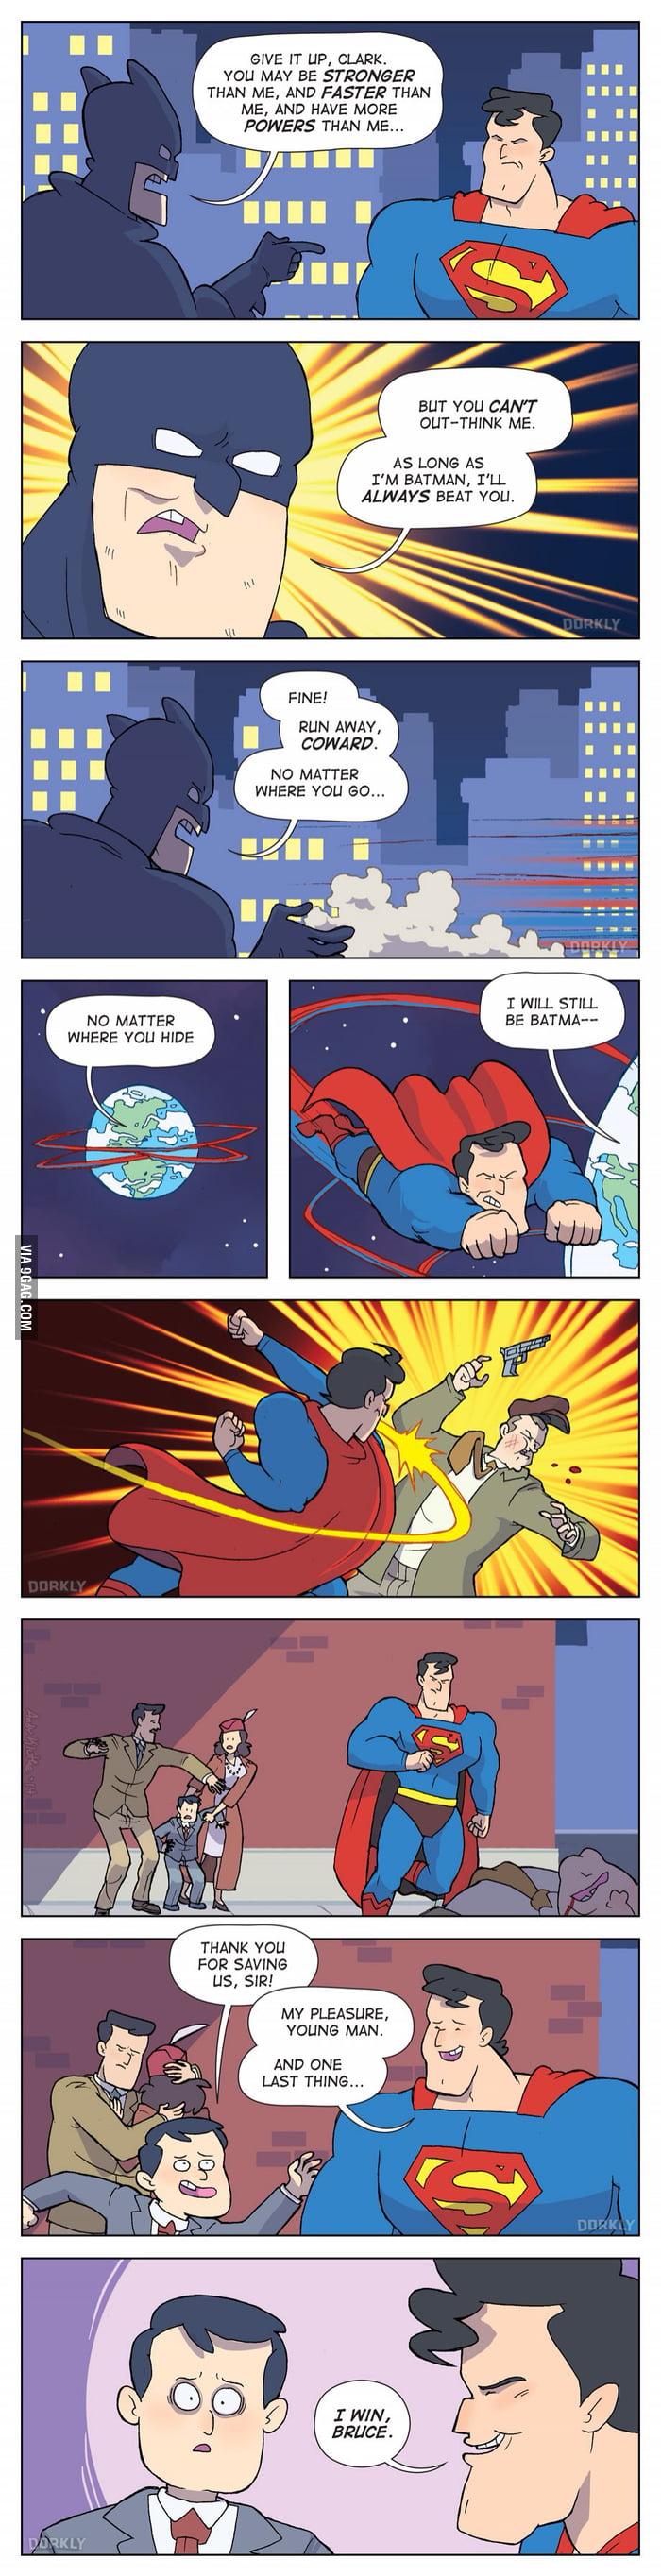 One way Superman could beat Batman